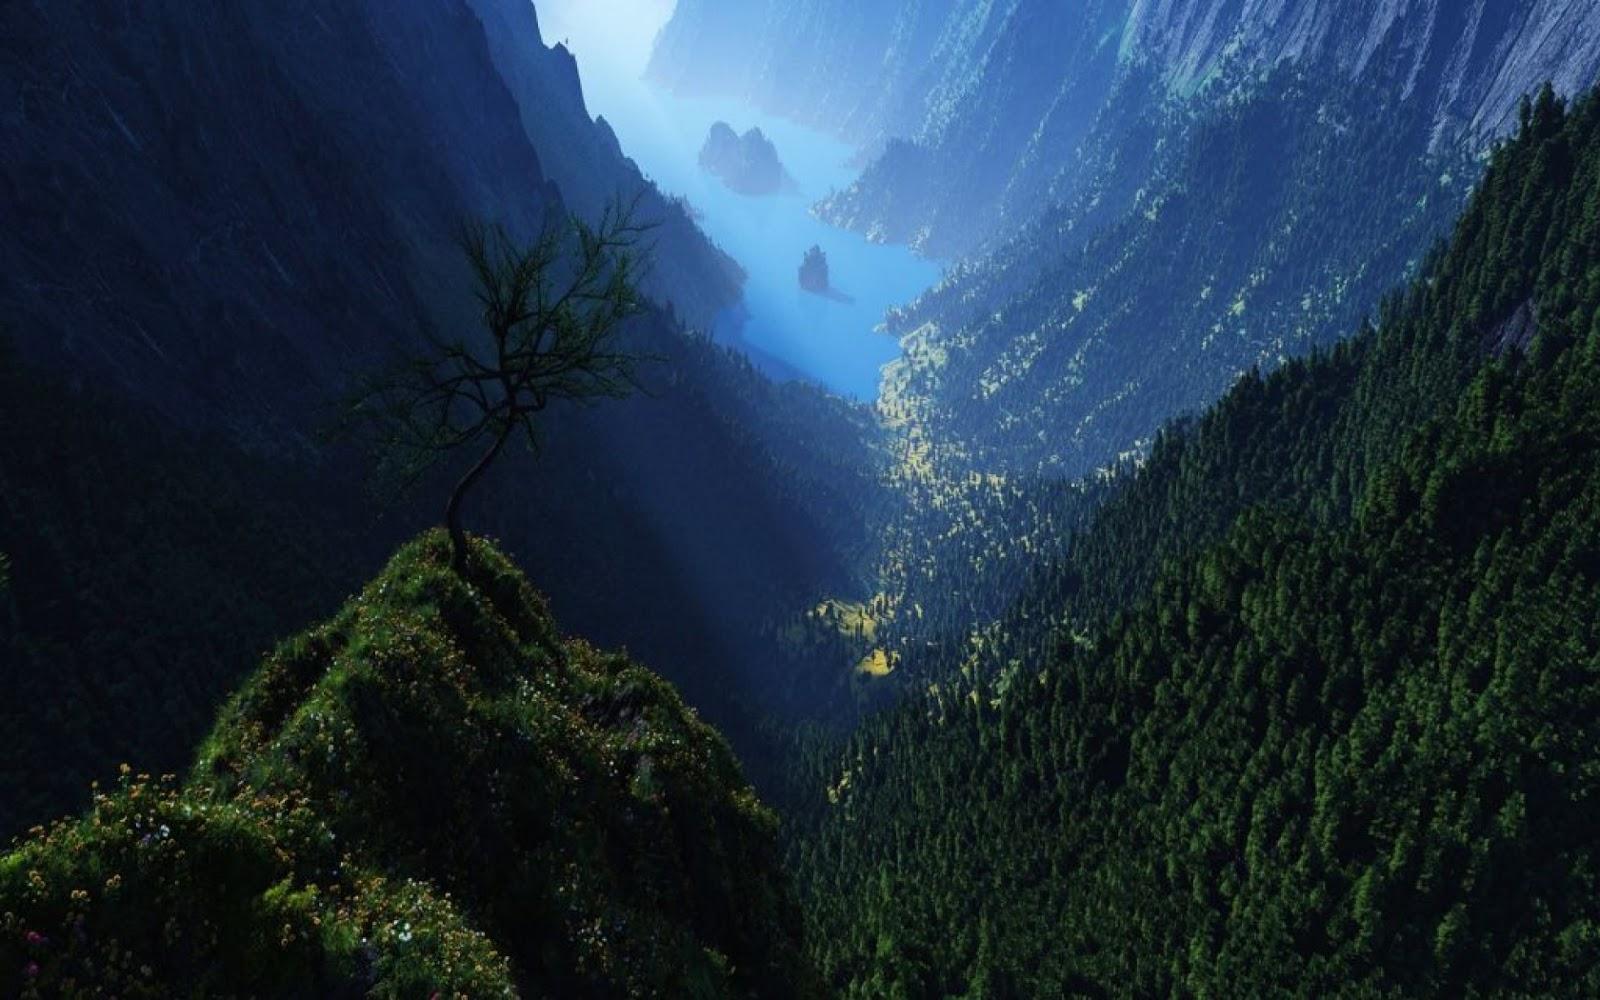 Mountain Forest 4K HD Desktop Wallpaper